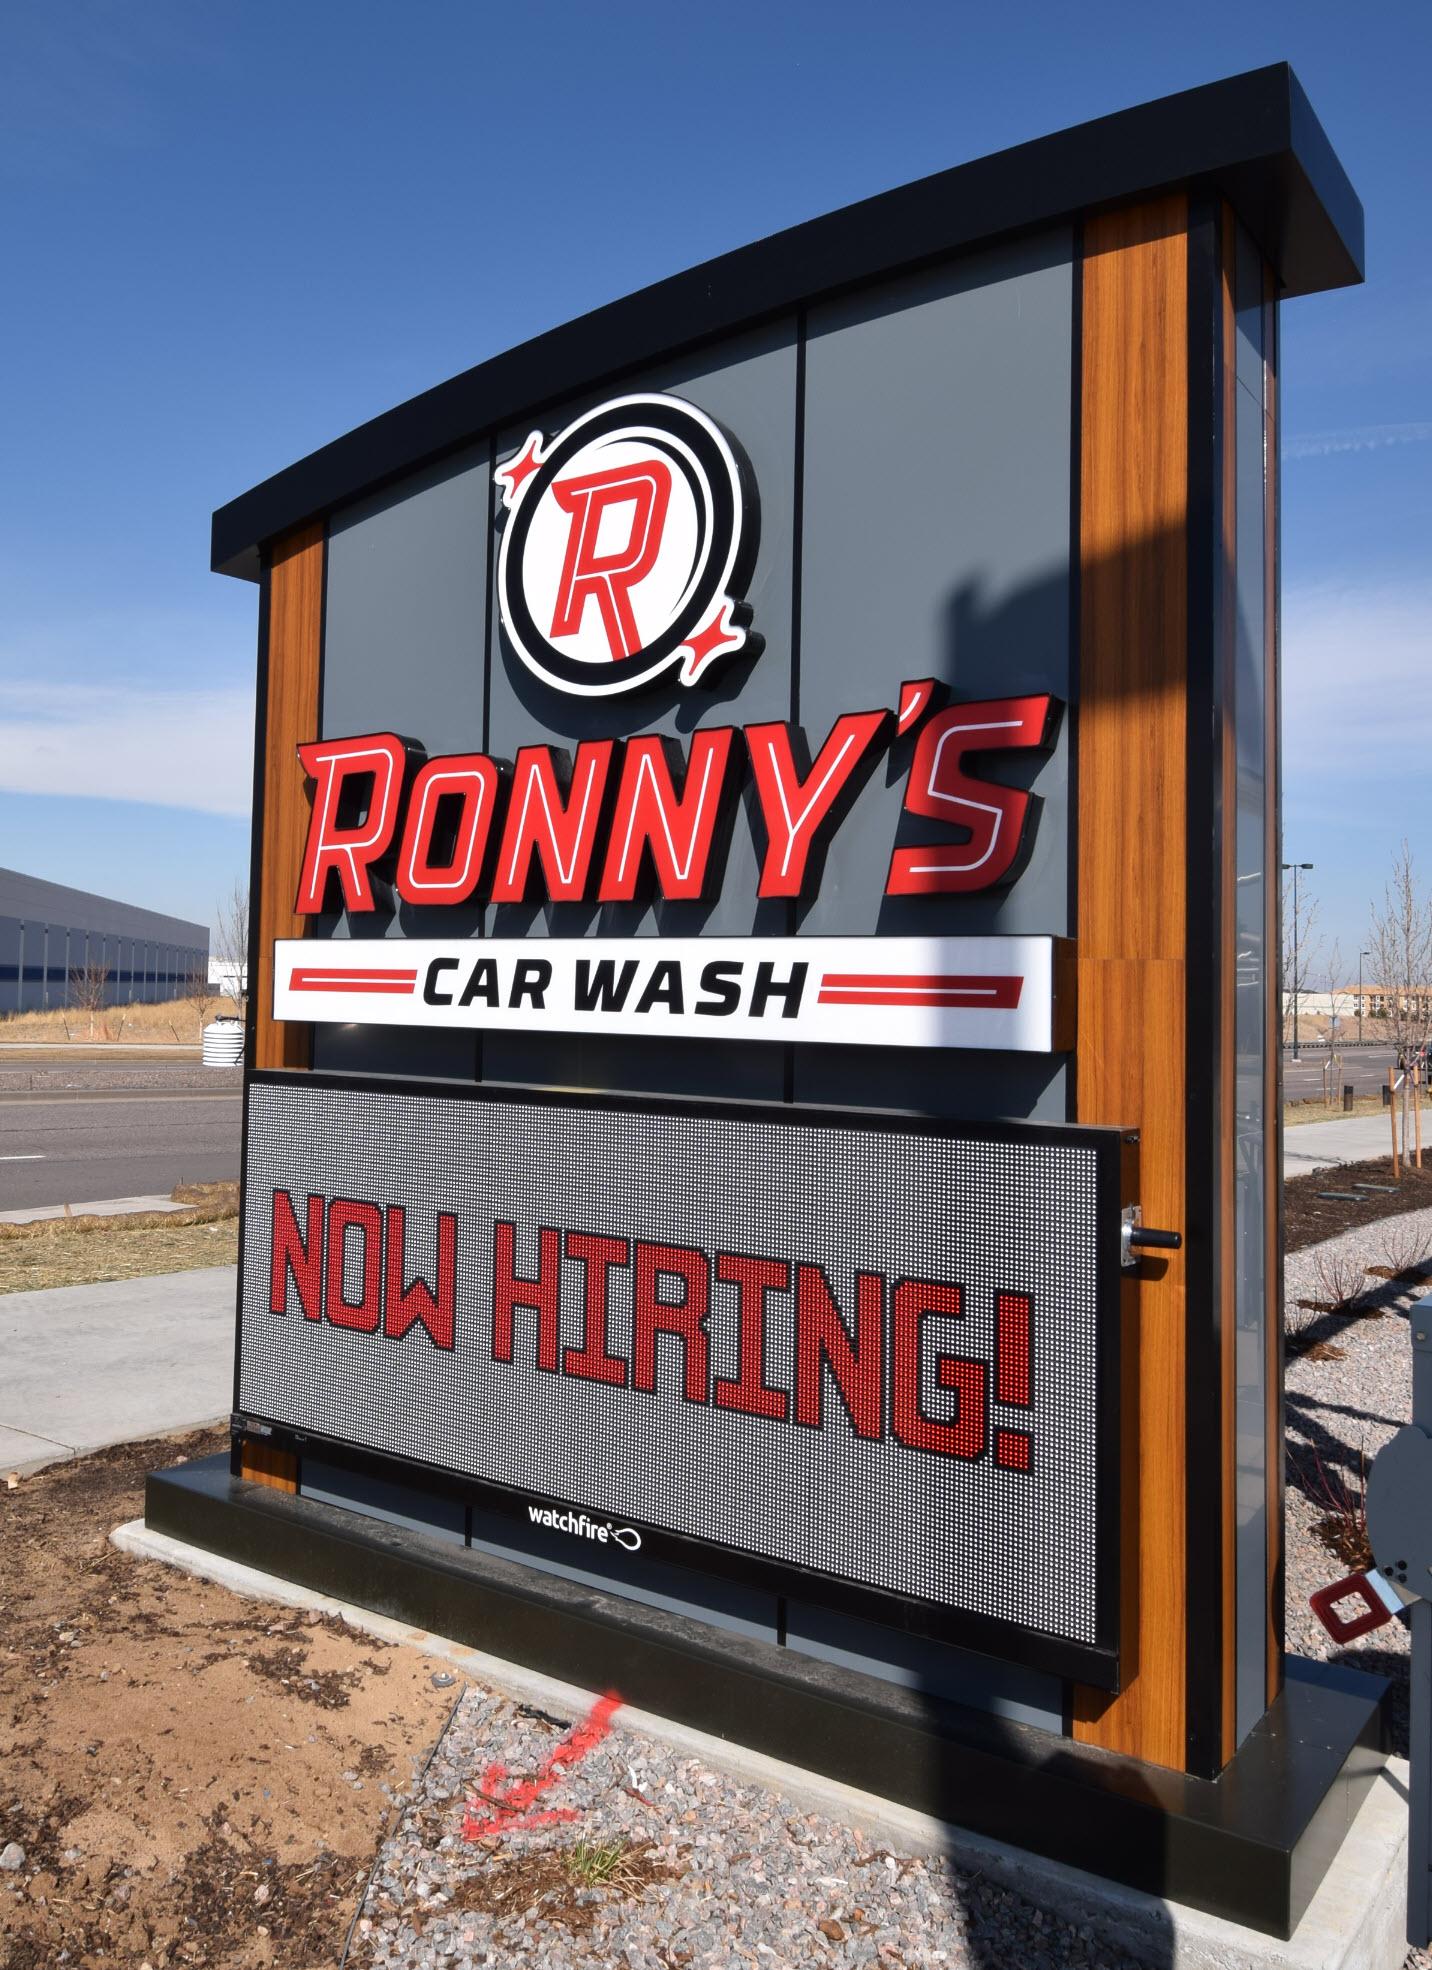 Ronny's Car Wash